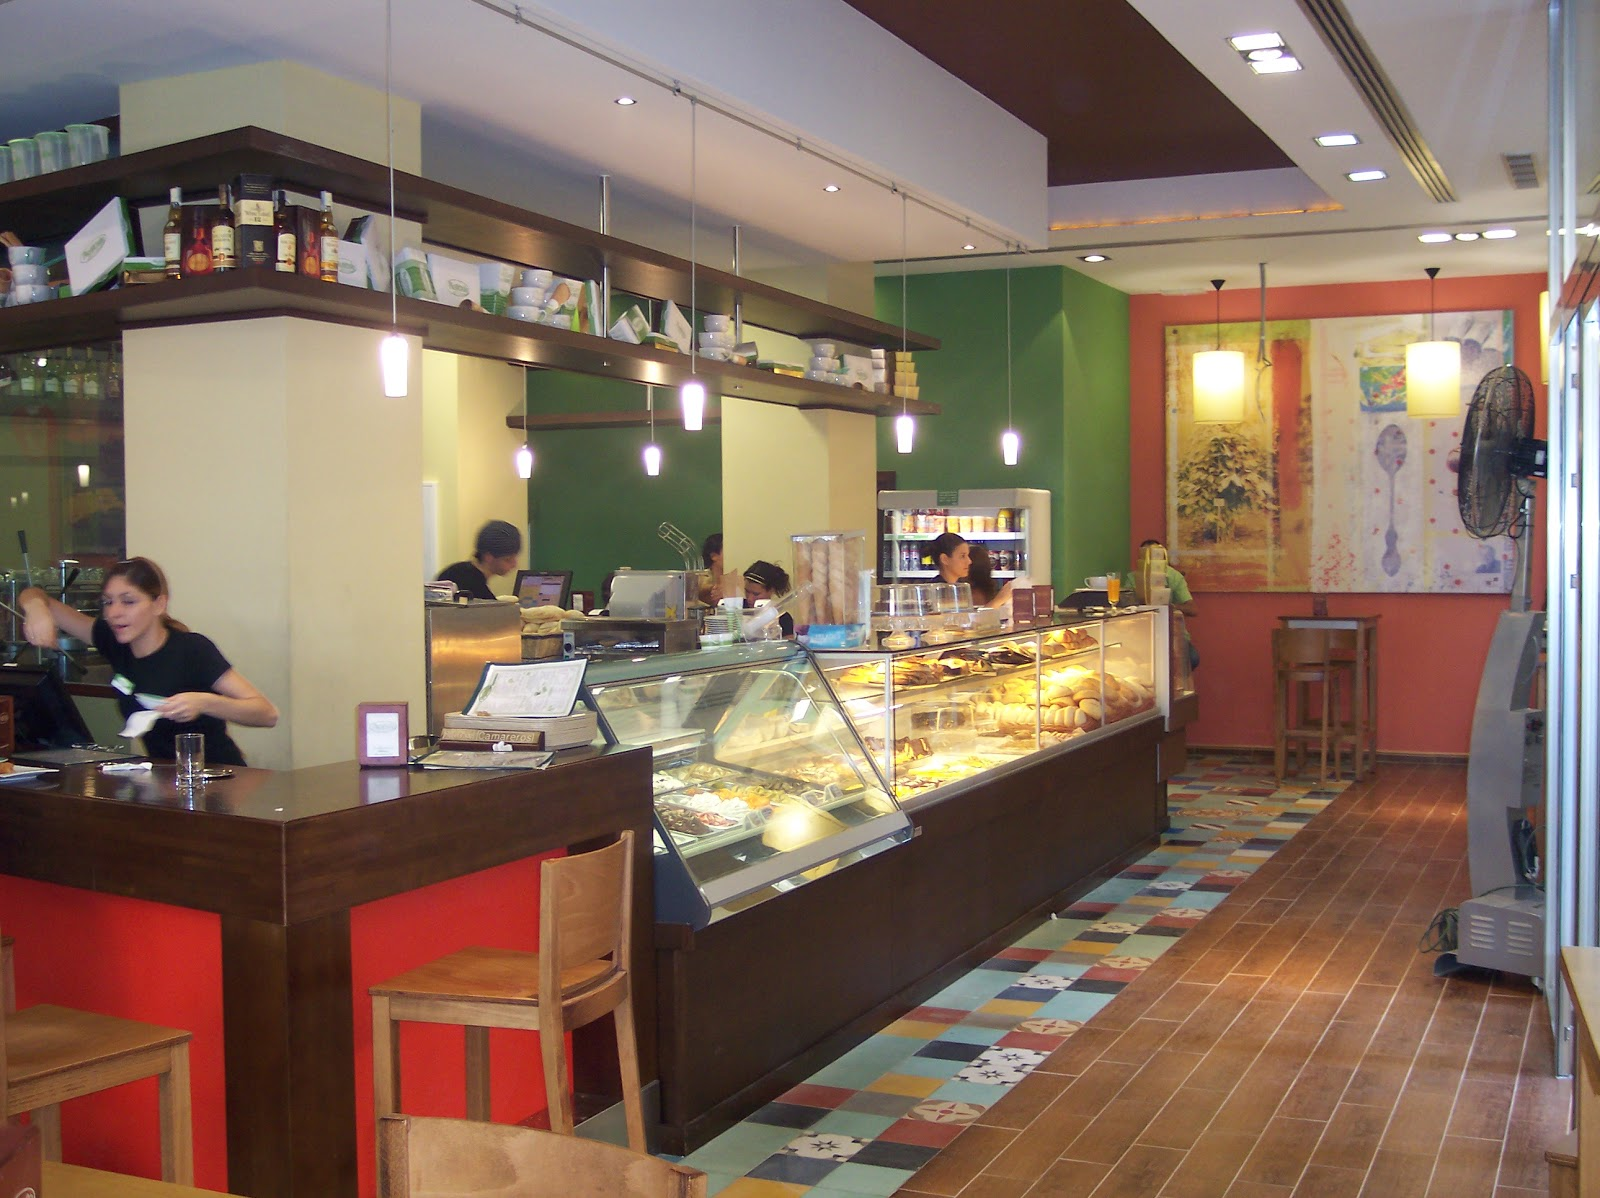 Decoracion cafeterias modernas - Diseno cafeterias modernas ...